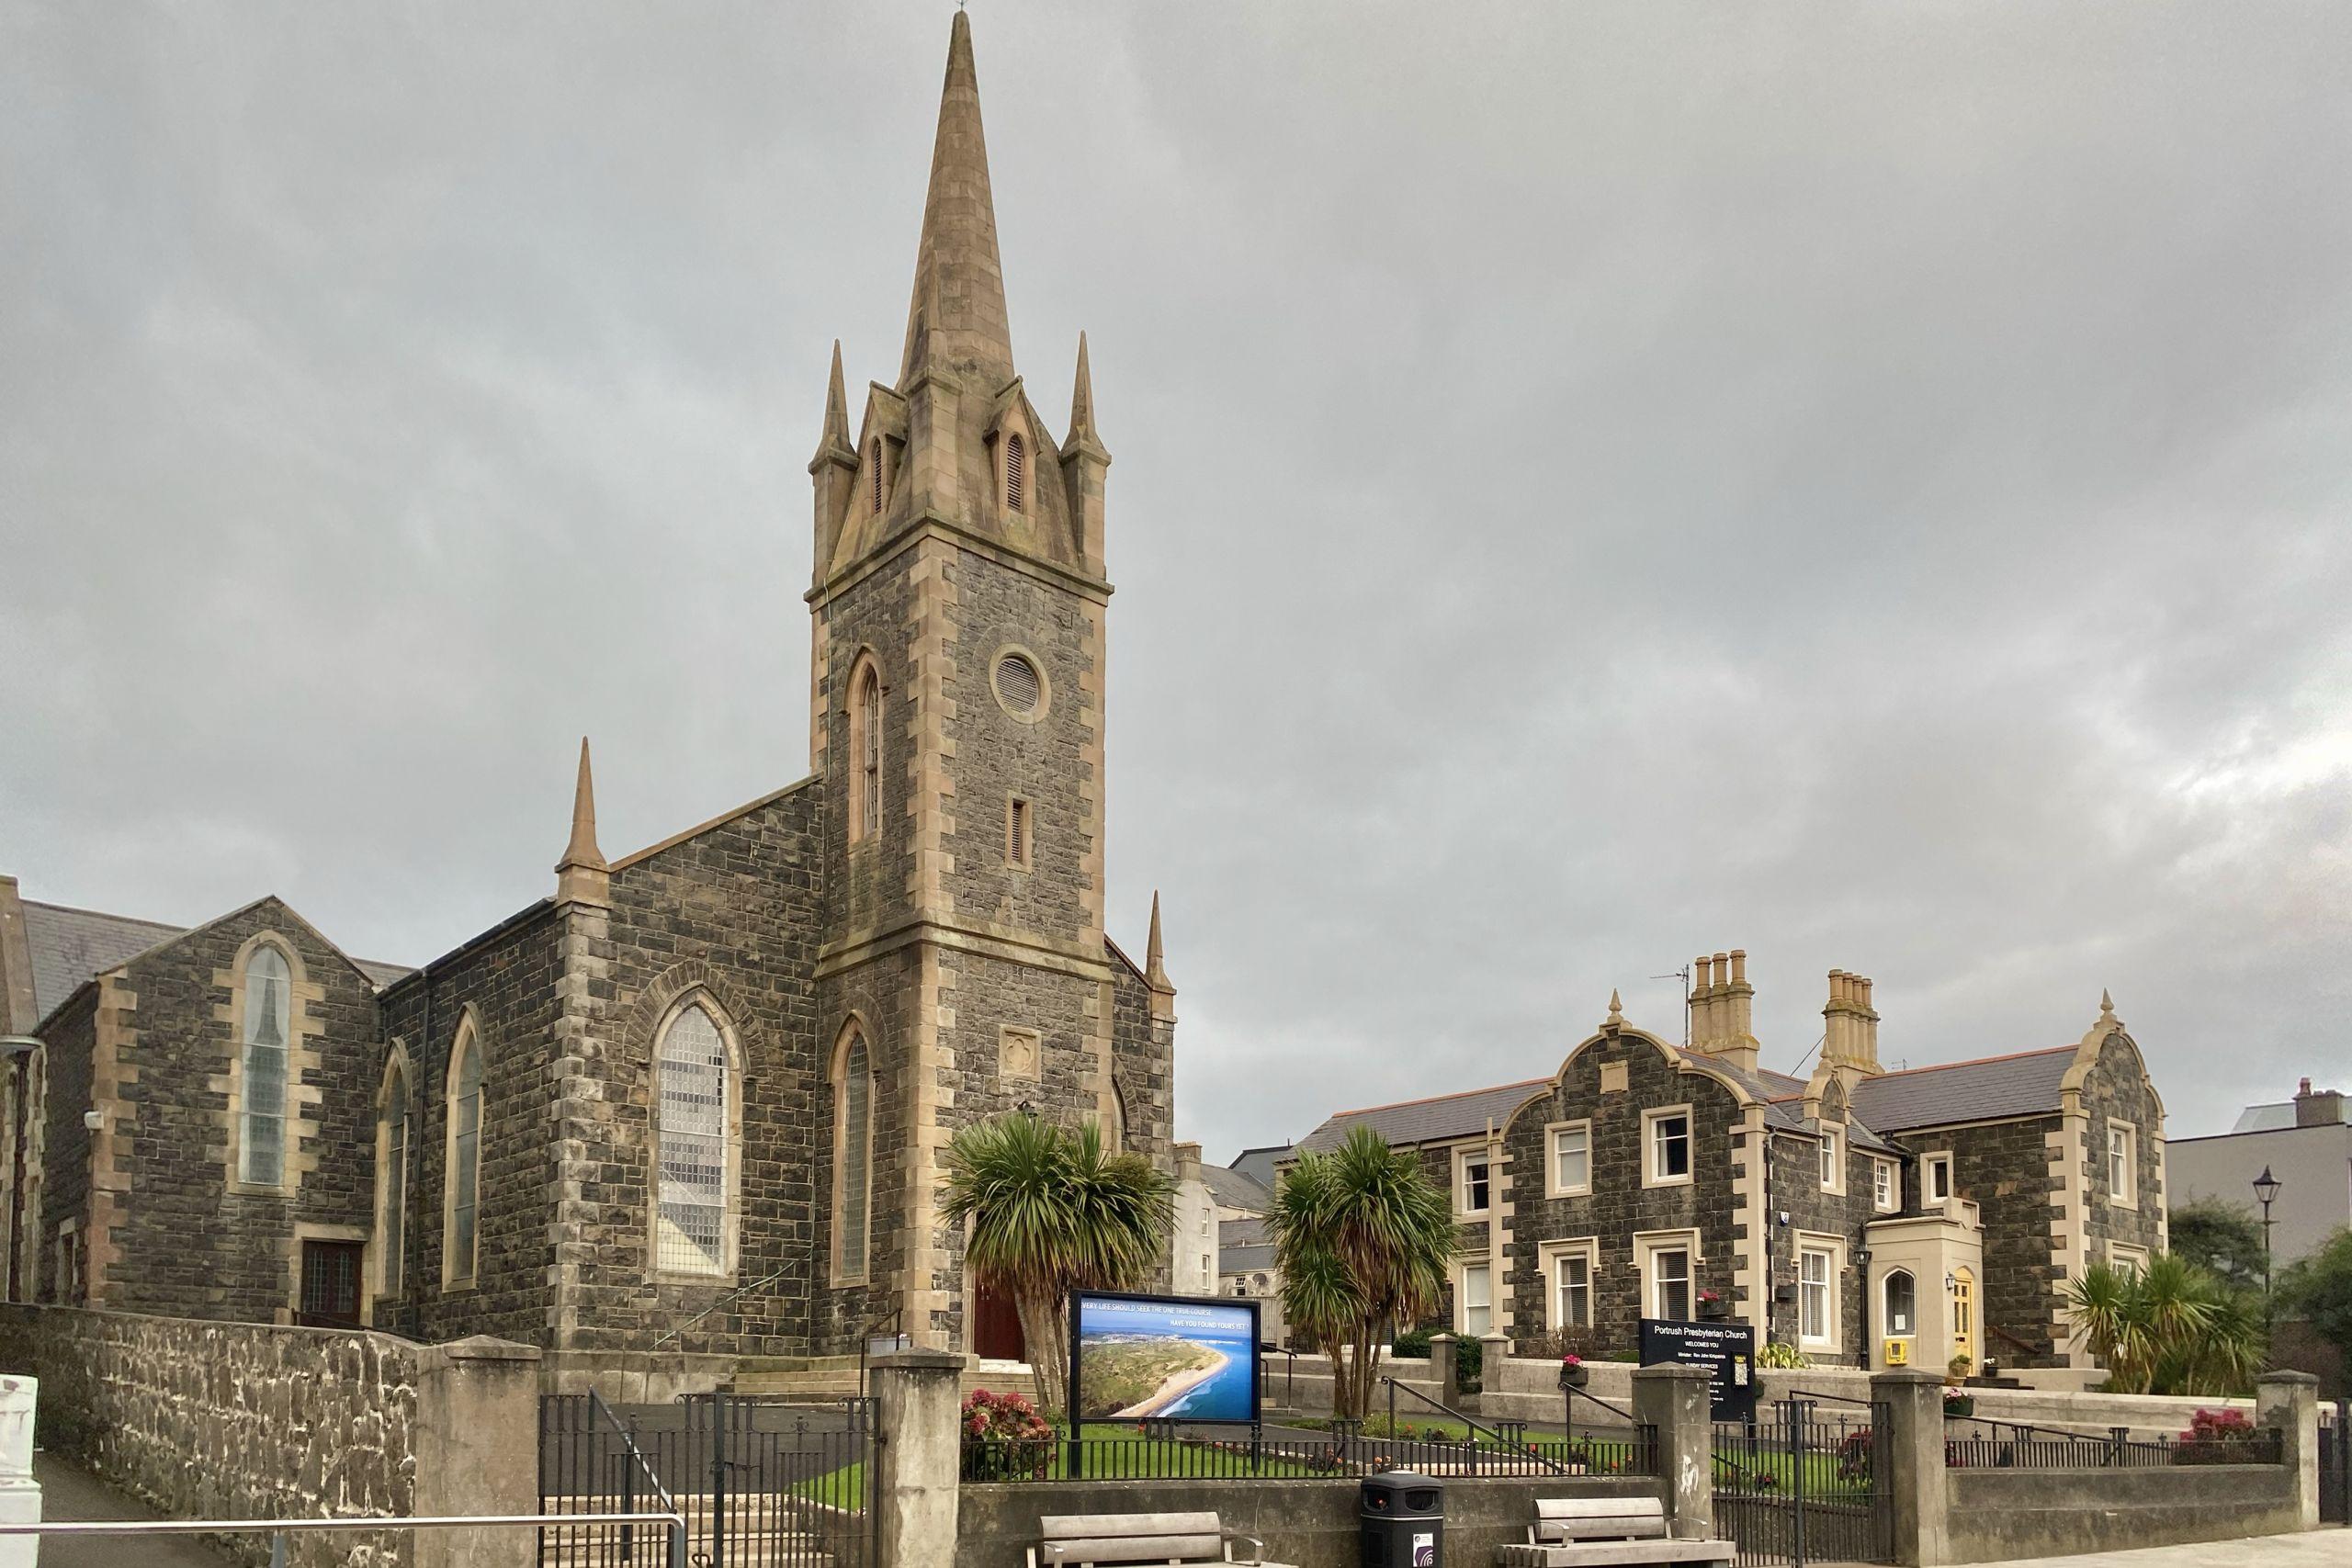 Portrush Presbyterian Church